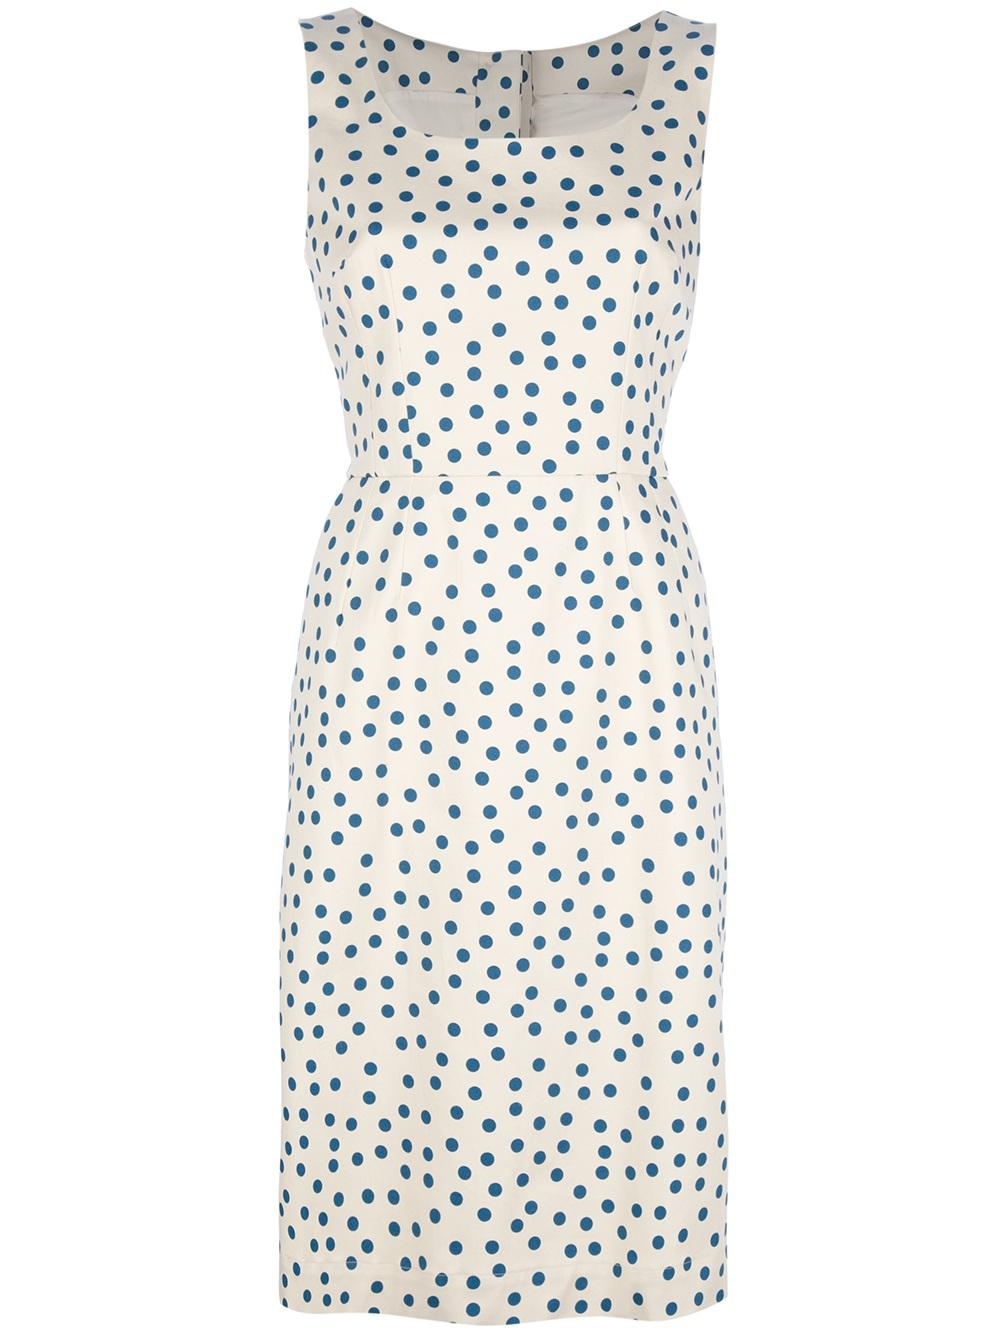 Dolce & gabbana Polka Dot Dress in White | Lyst